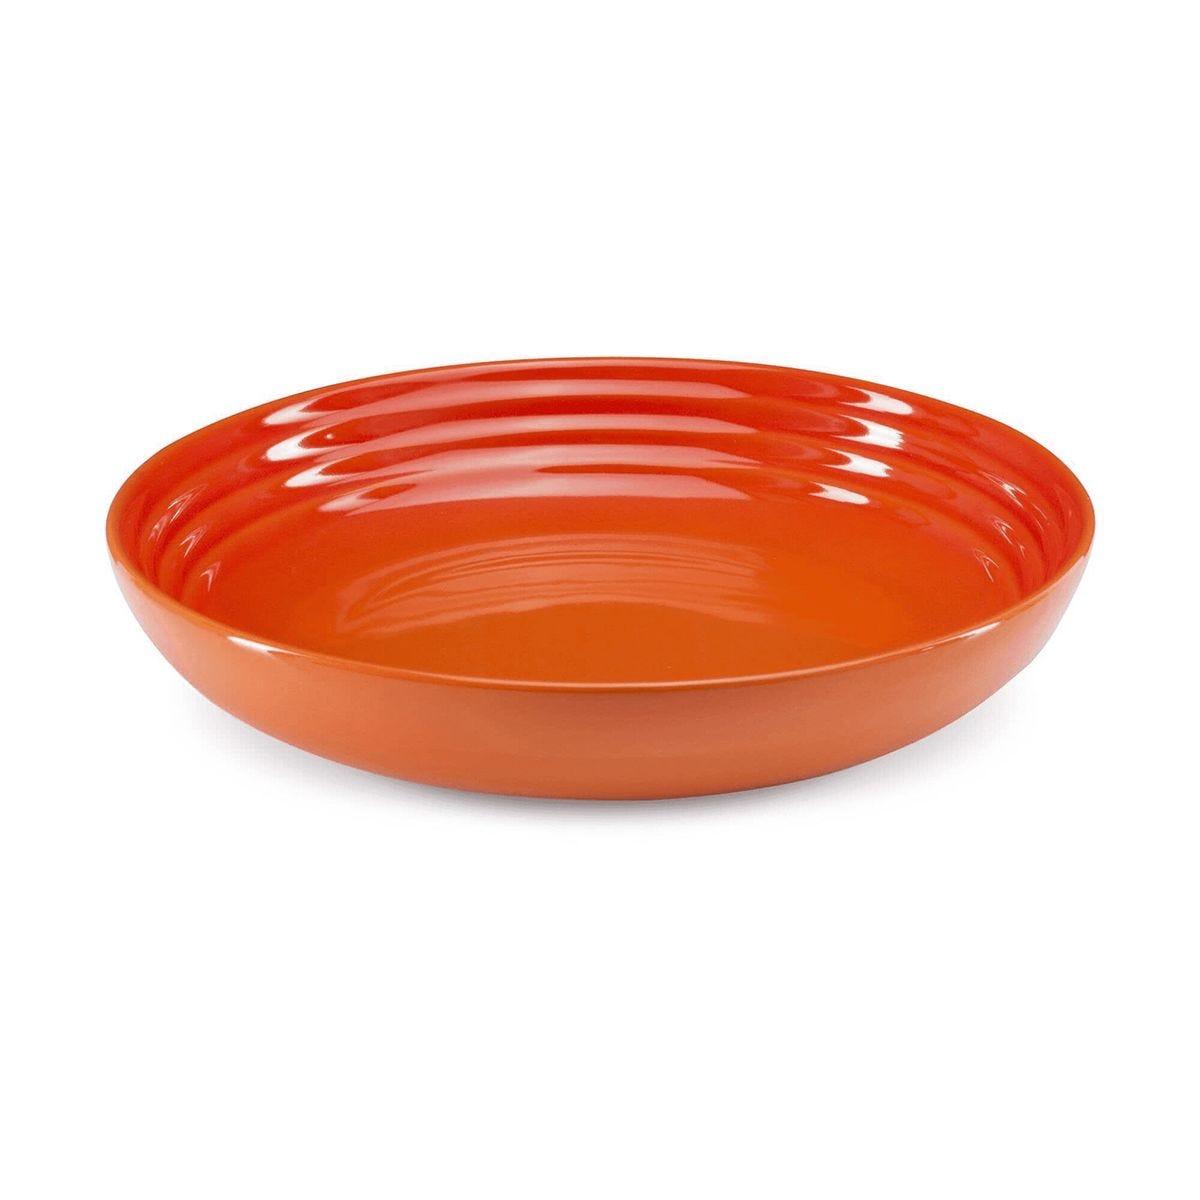 Le Creuset Stoneware Pasta Bowl 22cm Volcanic